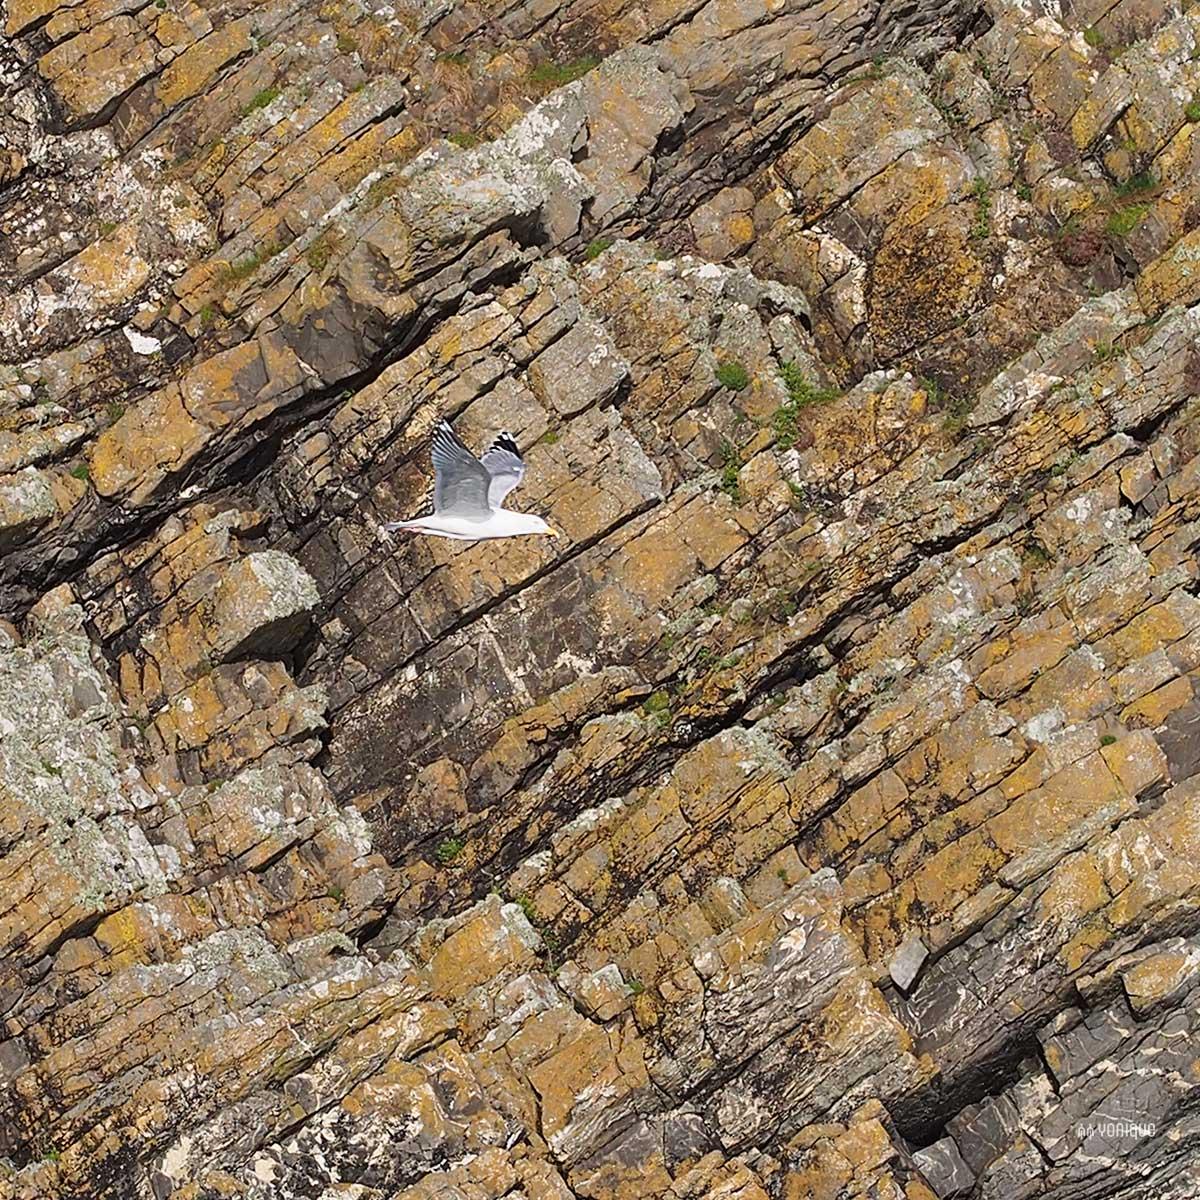 goeland-argente-larus-argentatus-cliff-nohoval-cove-cork-ireland-yoniquenews